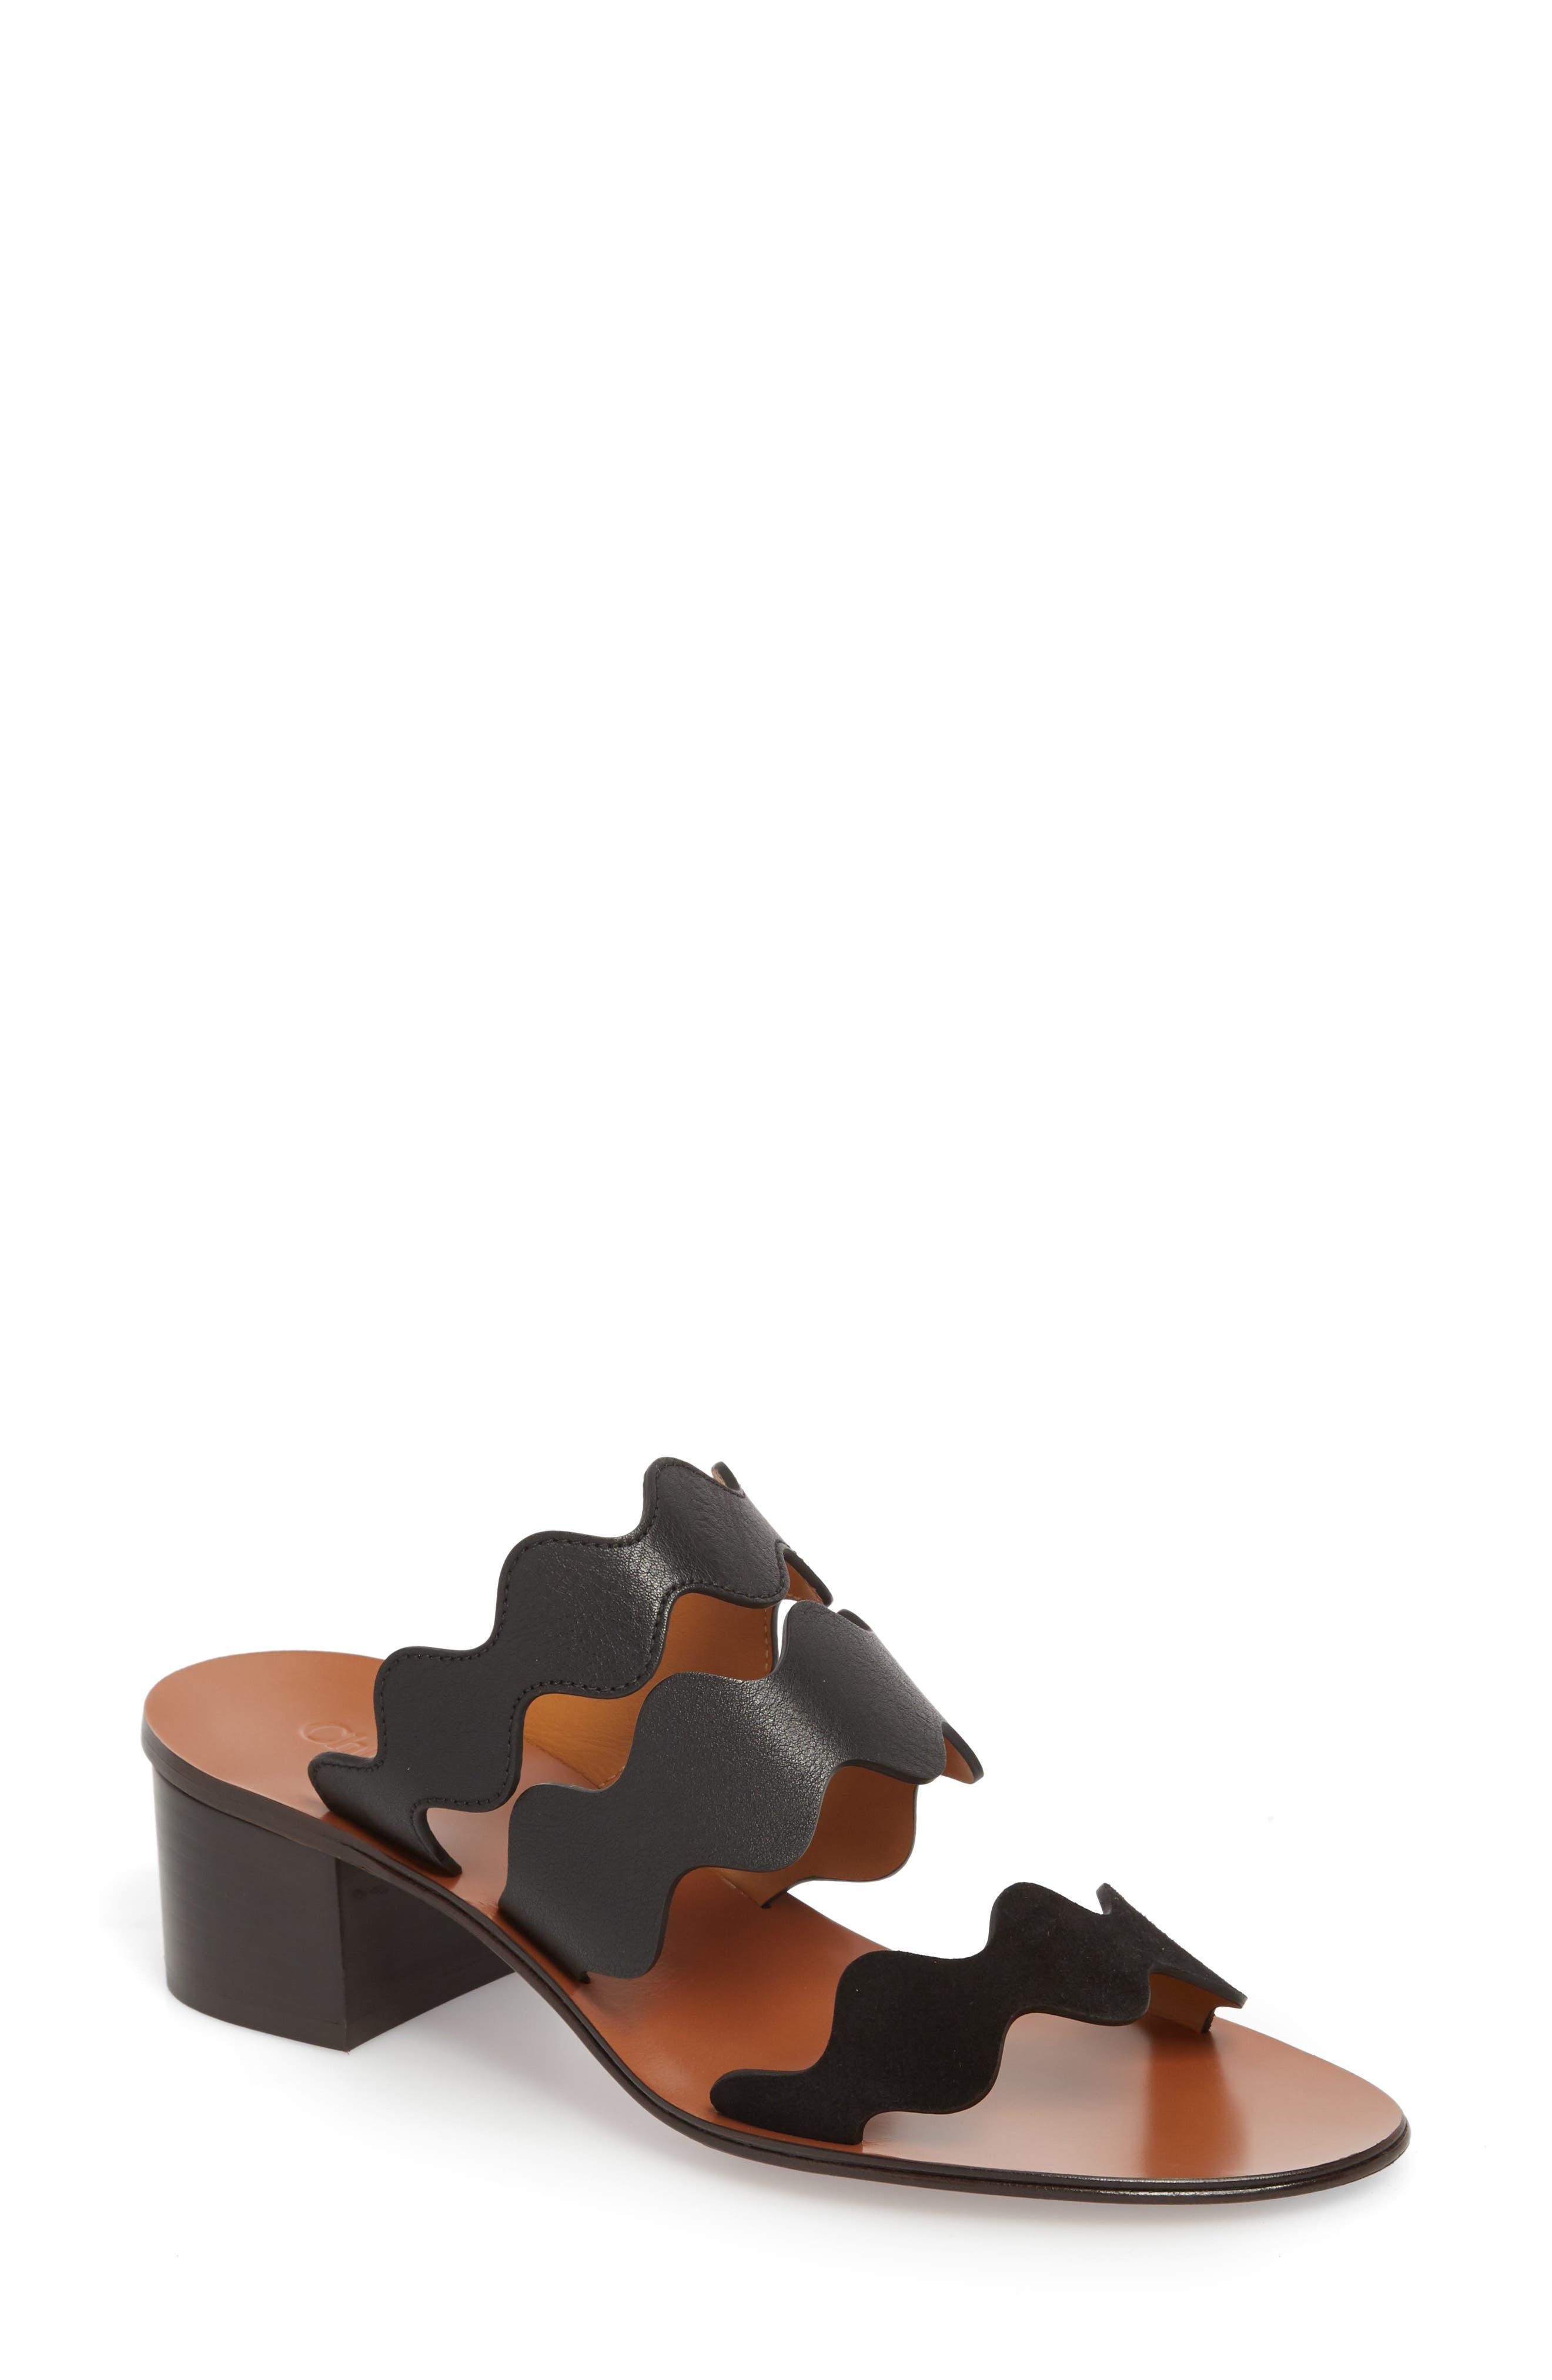 Lauren Slide Sandal,                         Main,                         color, Black